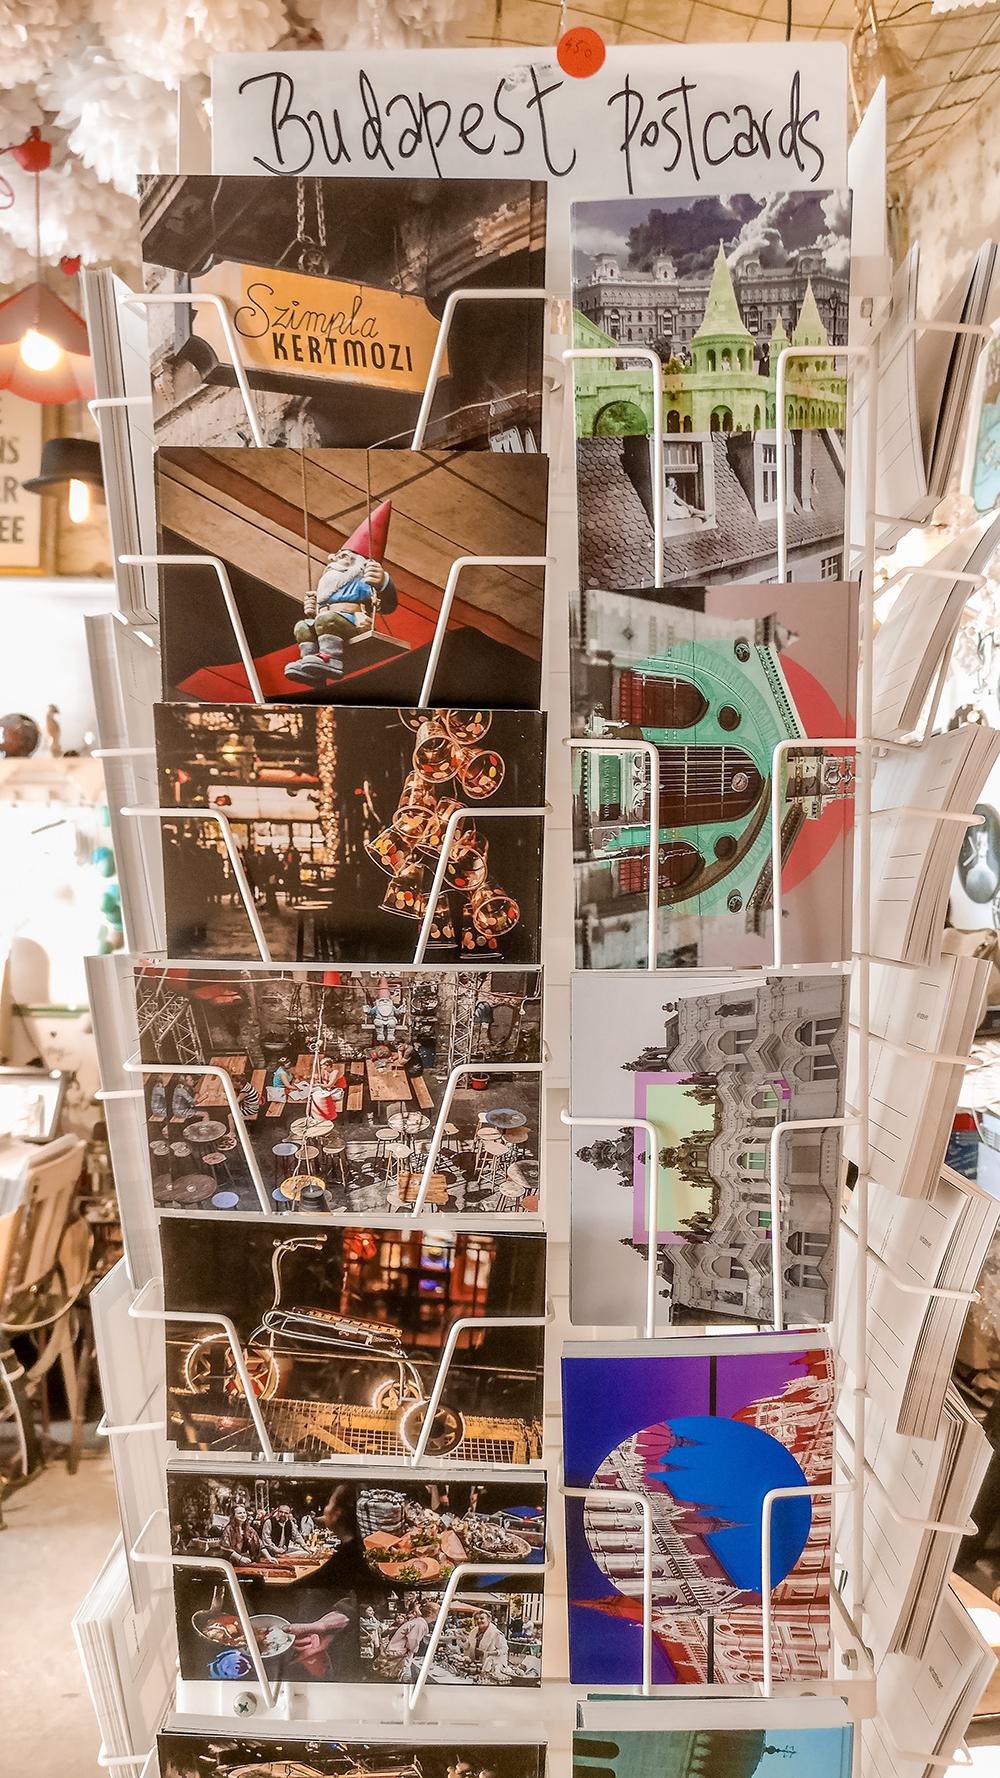 Szimpla Design Shop - Budapest design shop guide to best Hungarian souvenirs | Aliz's Wonderland